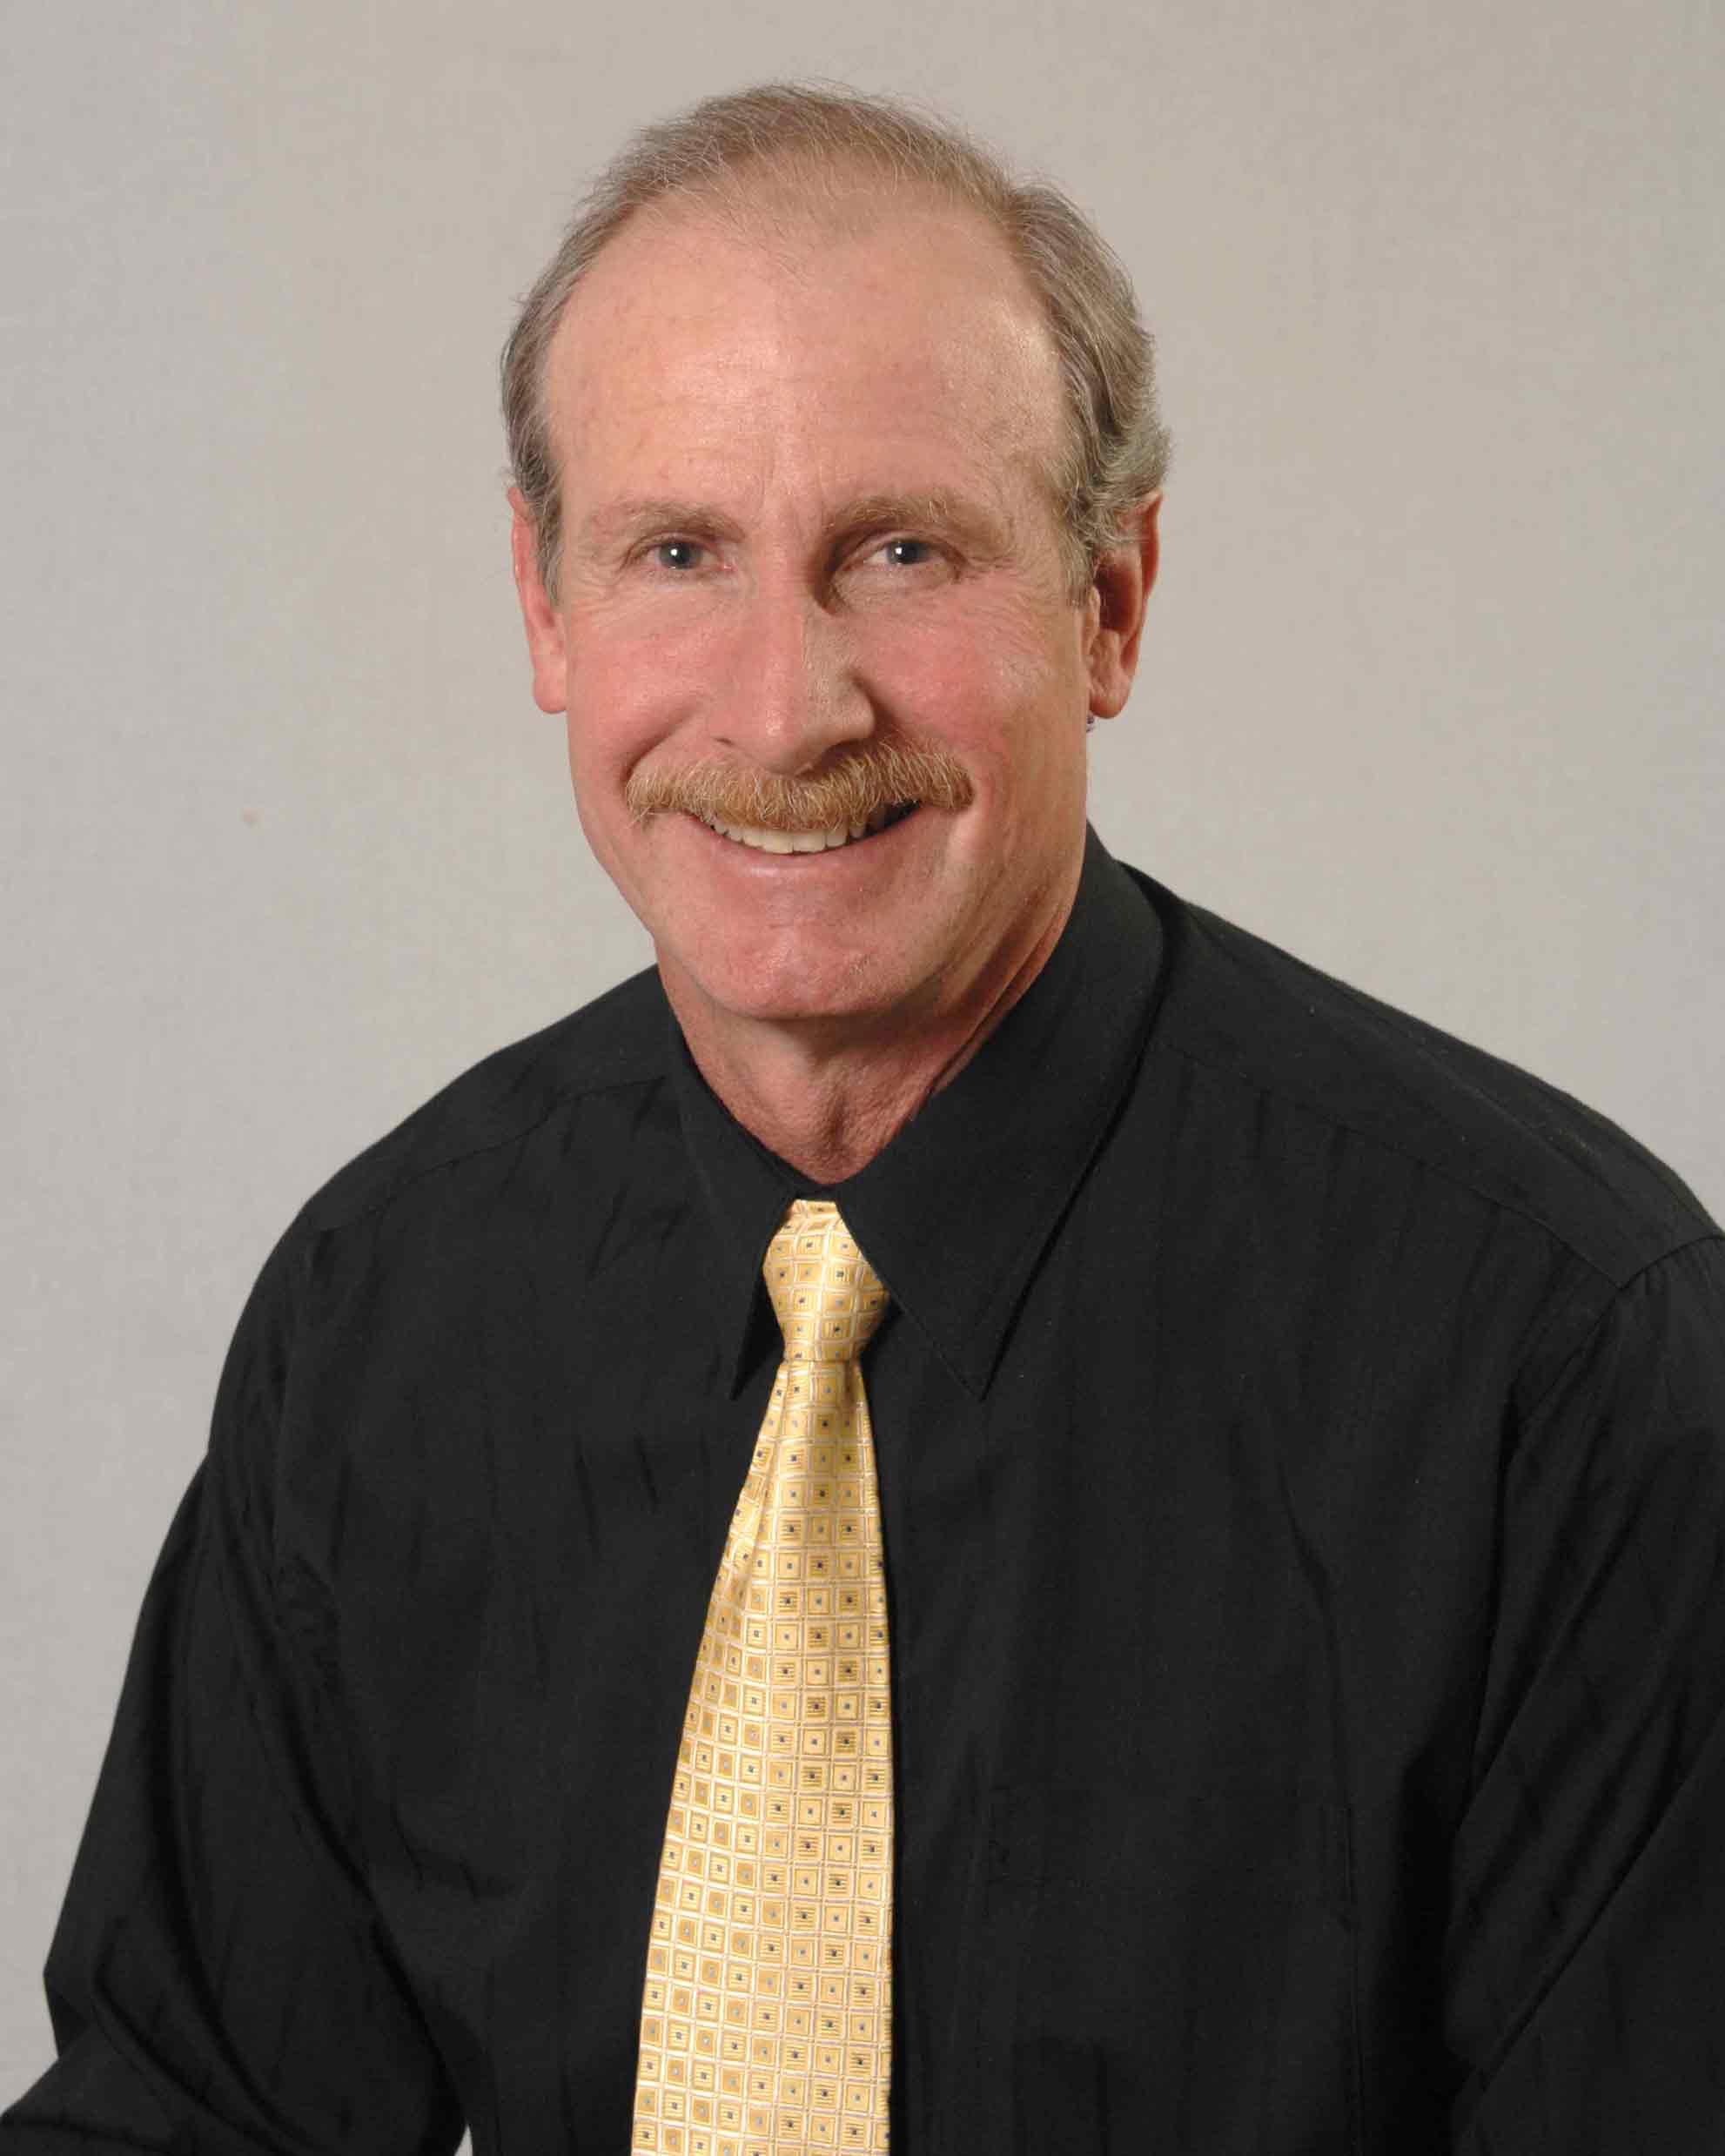 Gene Palma